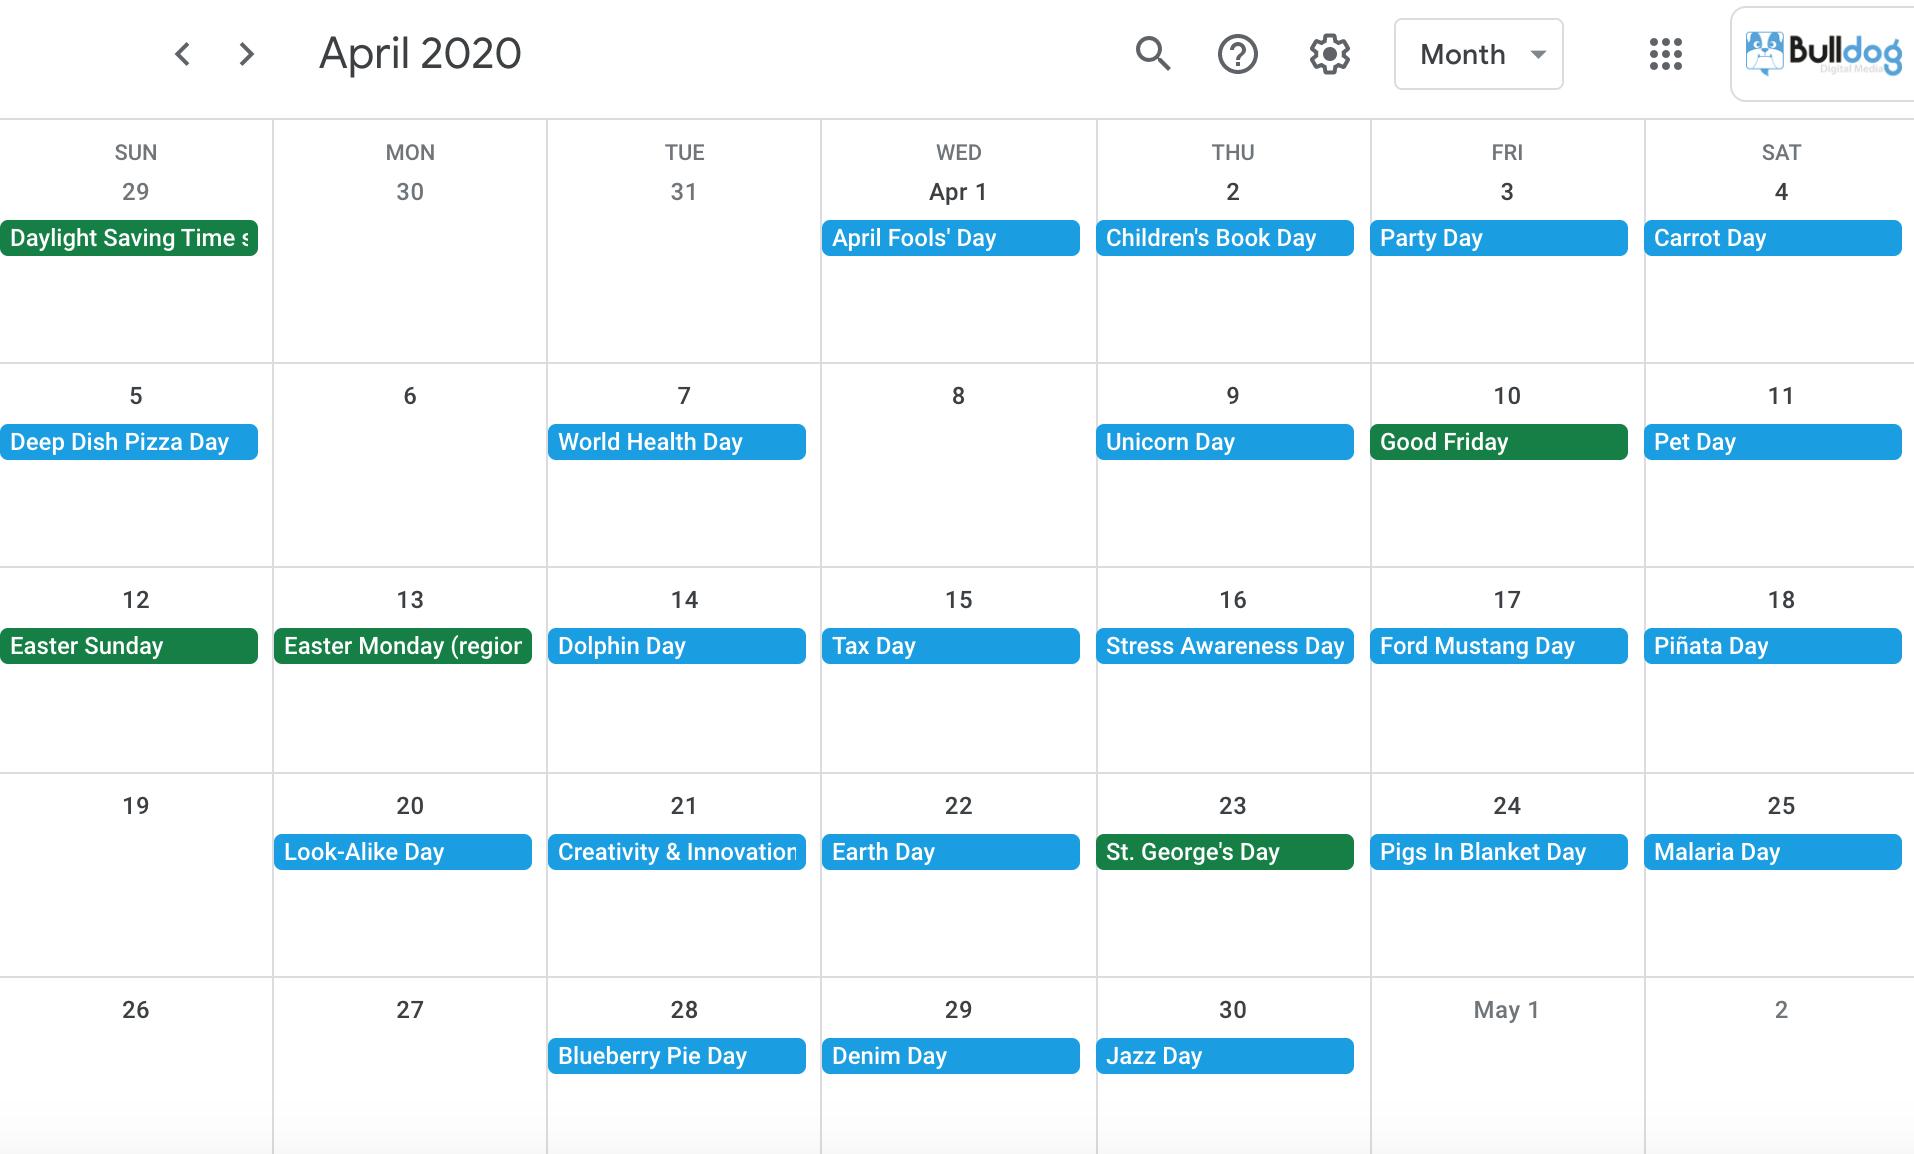 April 2020 social media holidays calendar